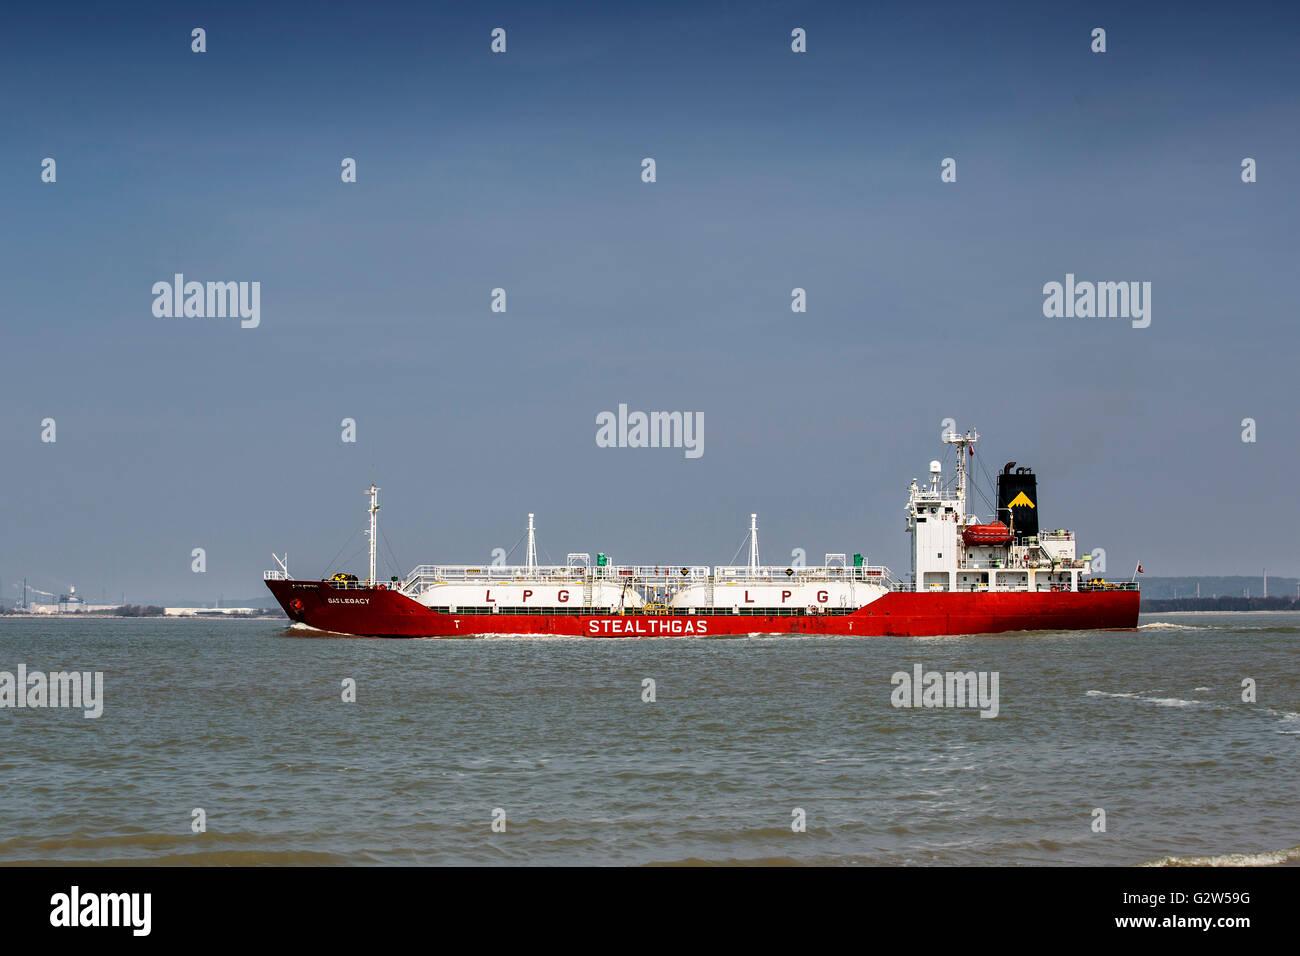 Lp Gas Stock Photos & Lp Gas Stock Images - Alamy